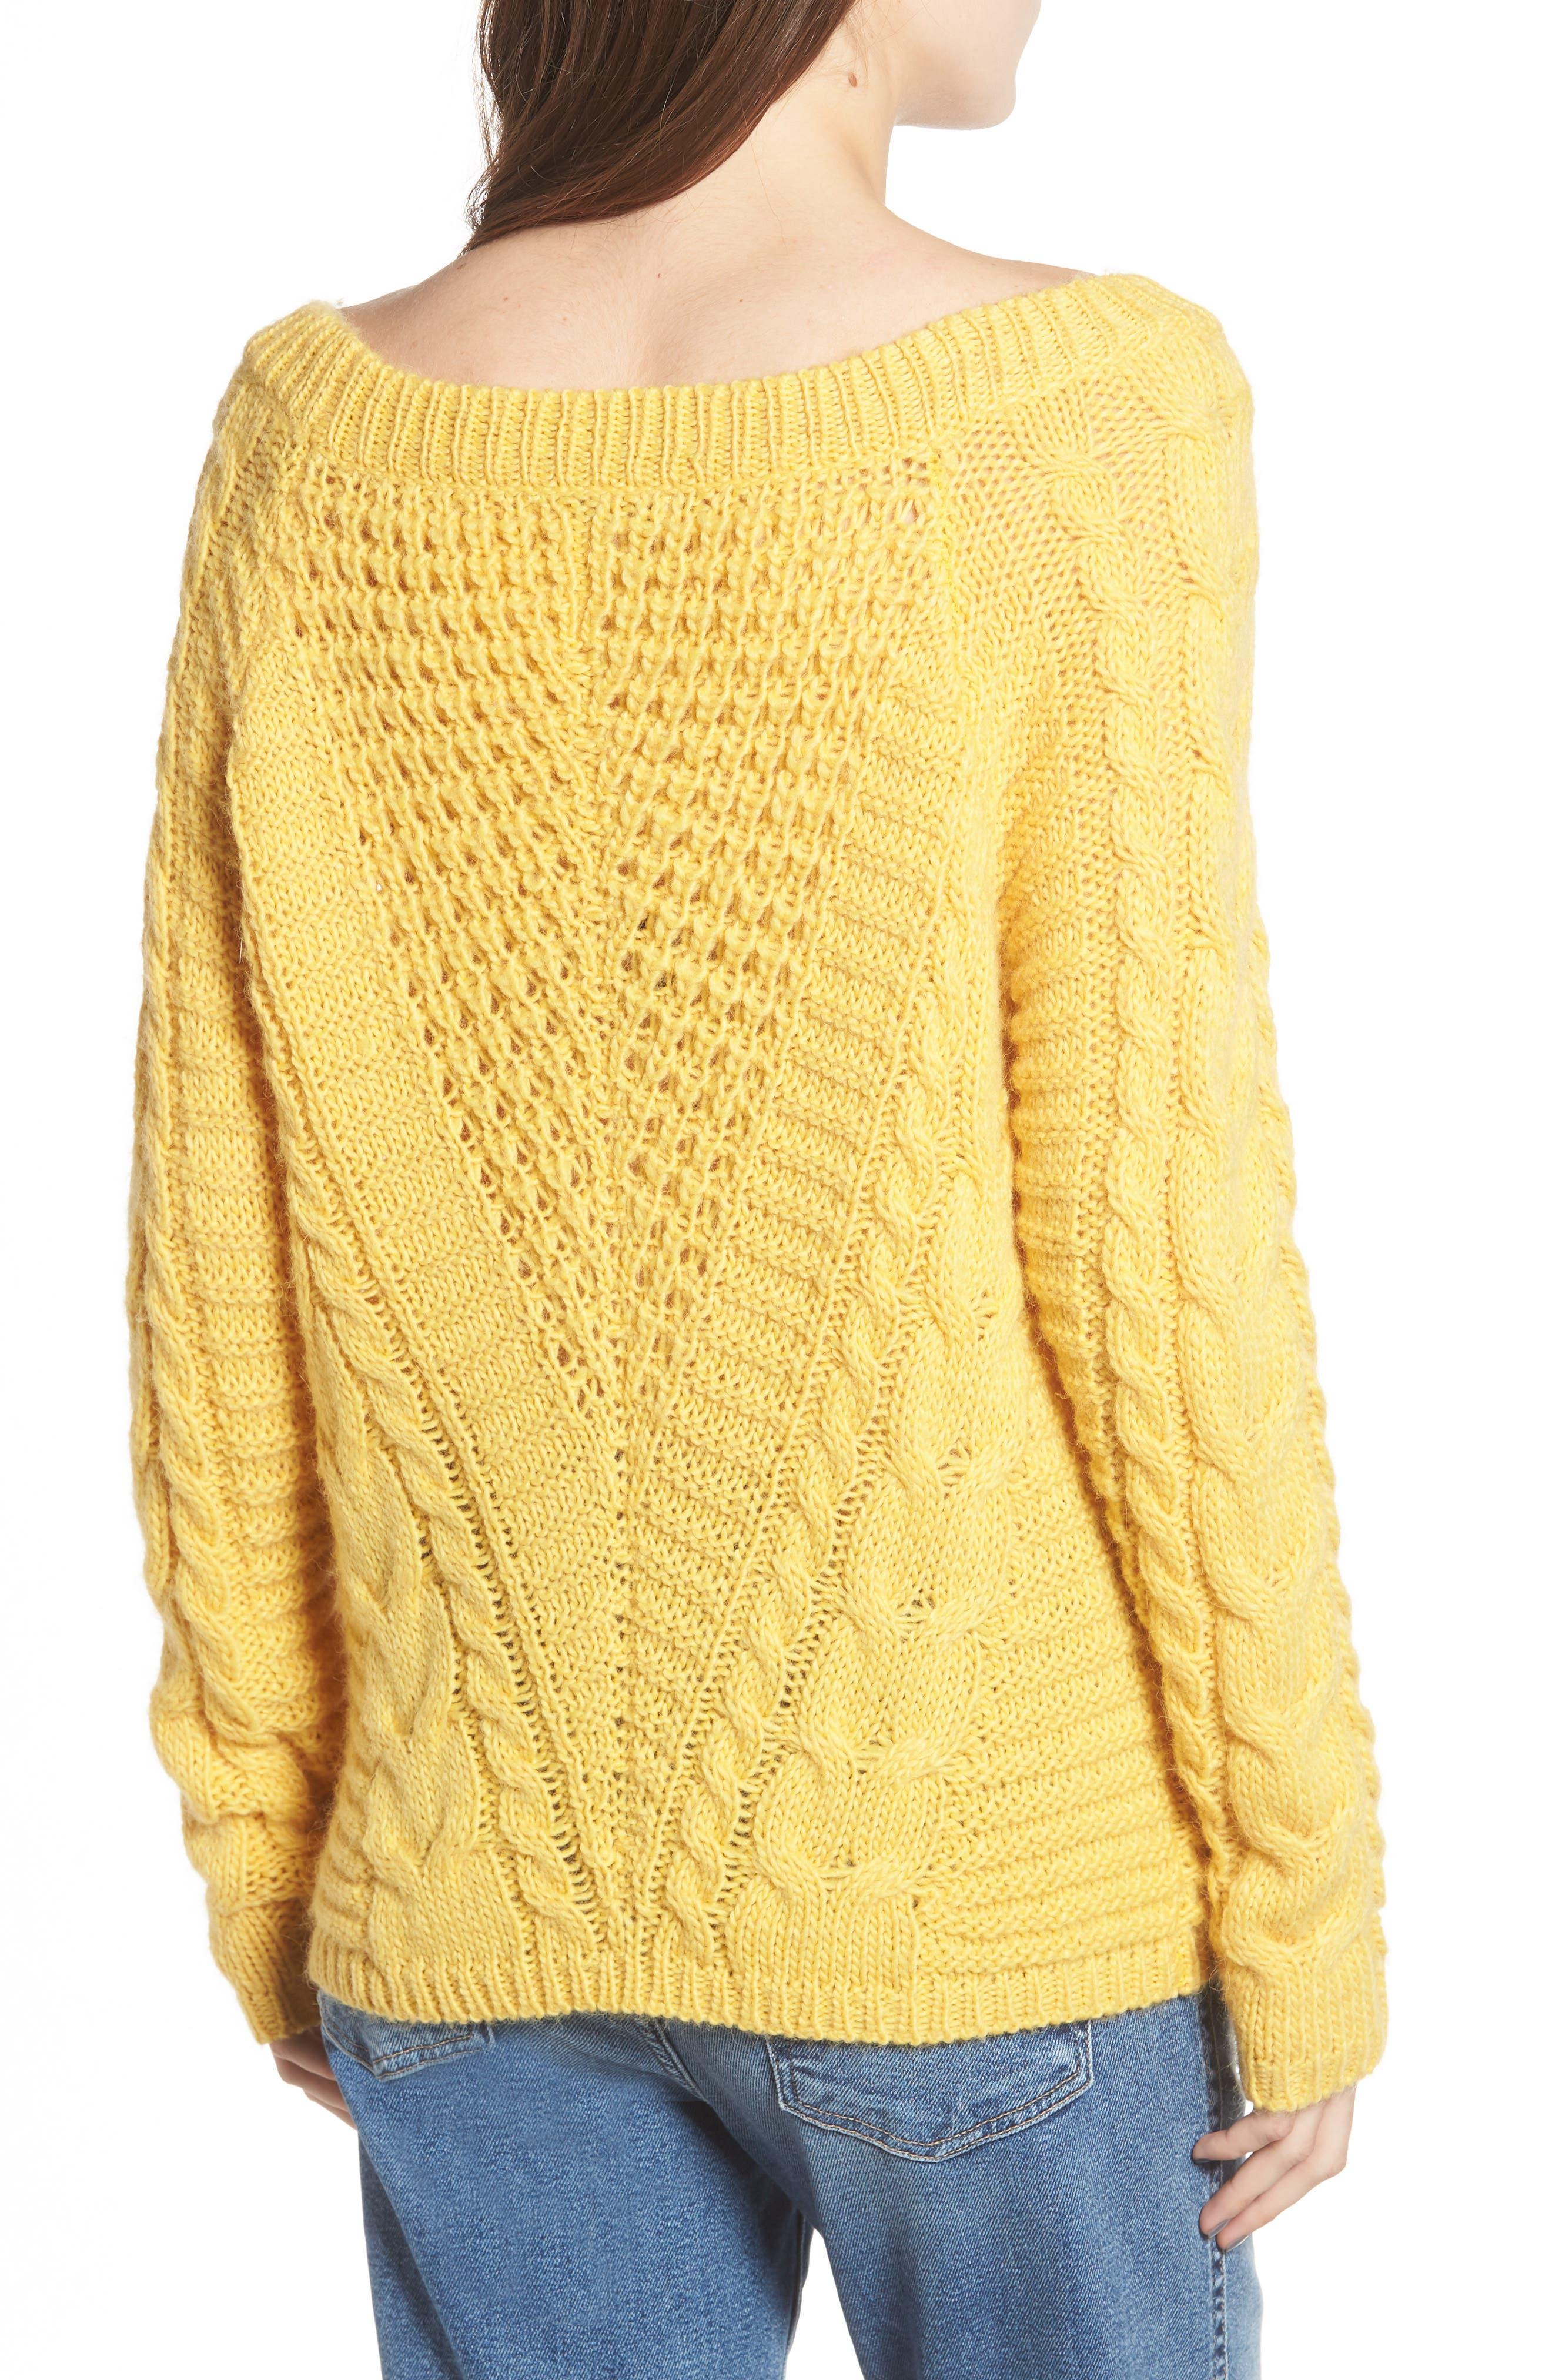 REBECCA MINKOFF,                             Juna Sweater,                             Alternate thumbnail 2, color,                             700